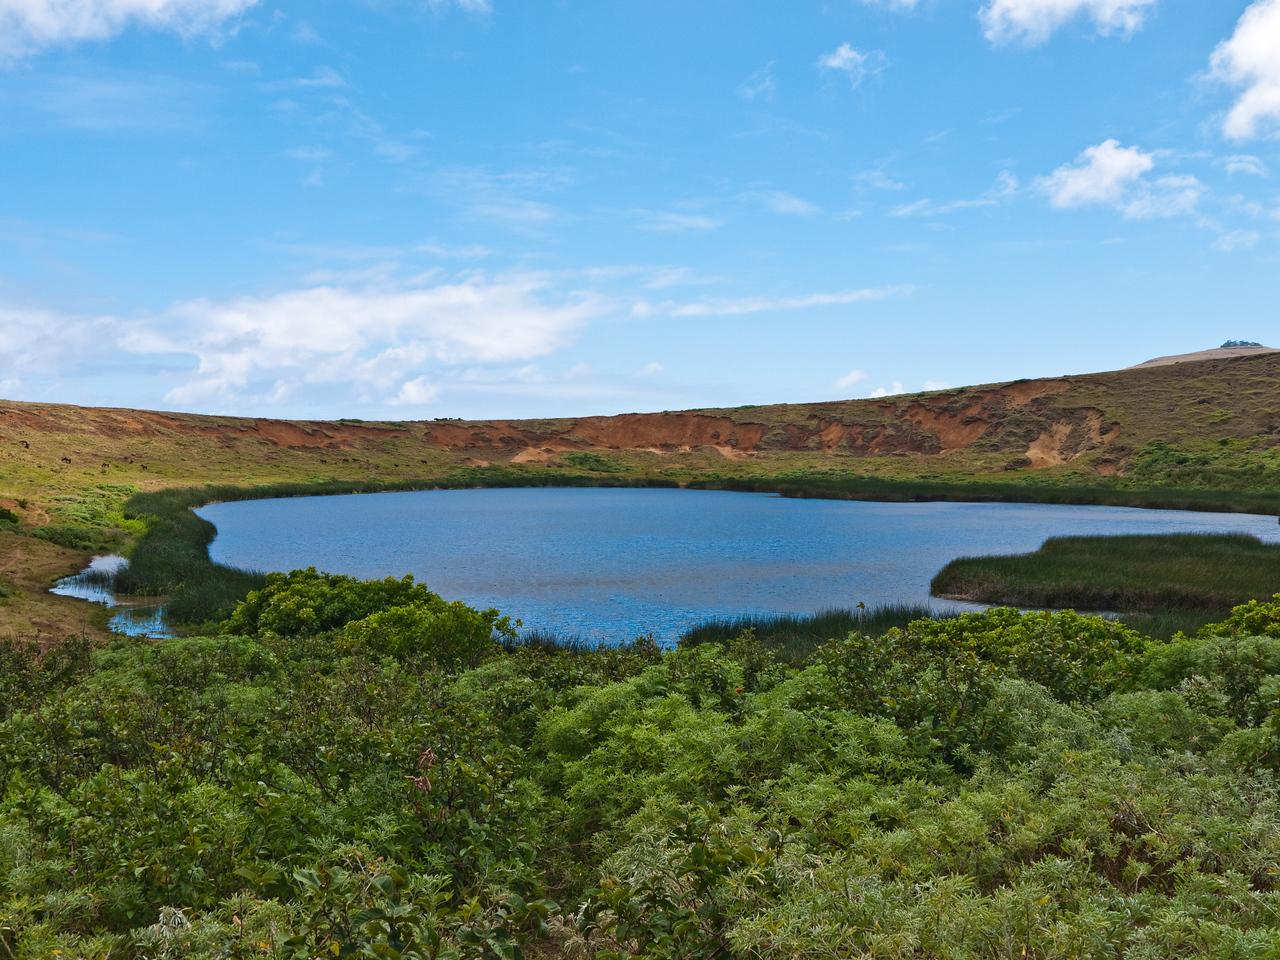 The lake inside the volcanic crater at Rano Raraku.